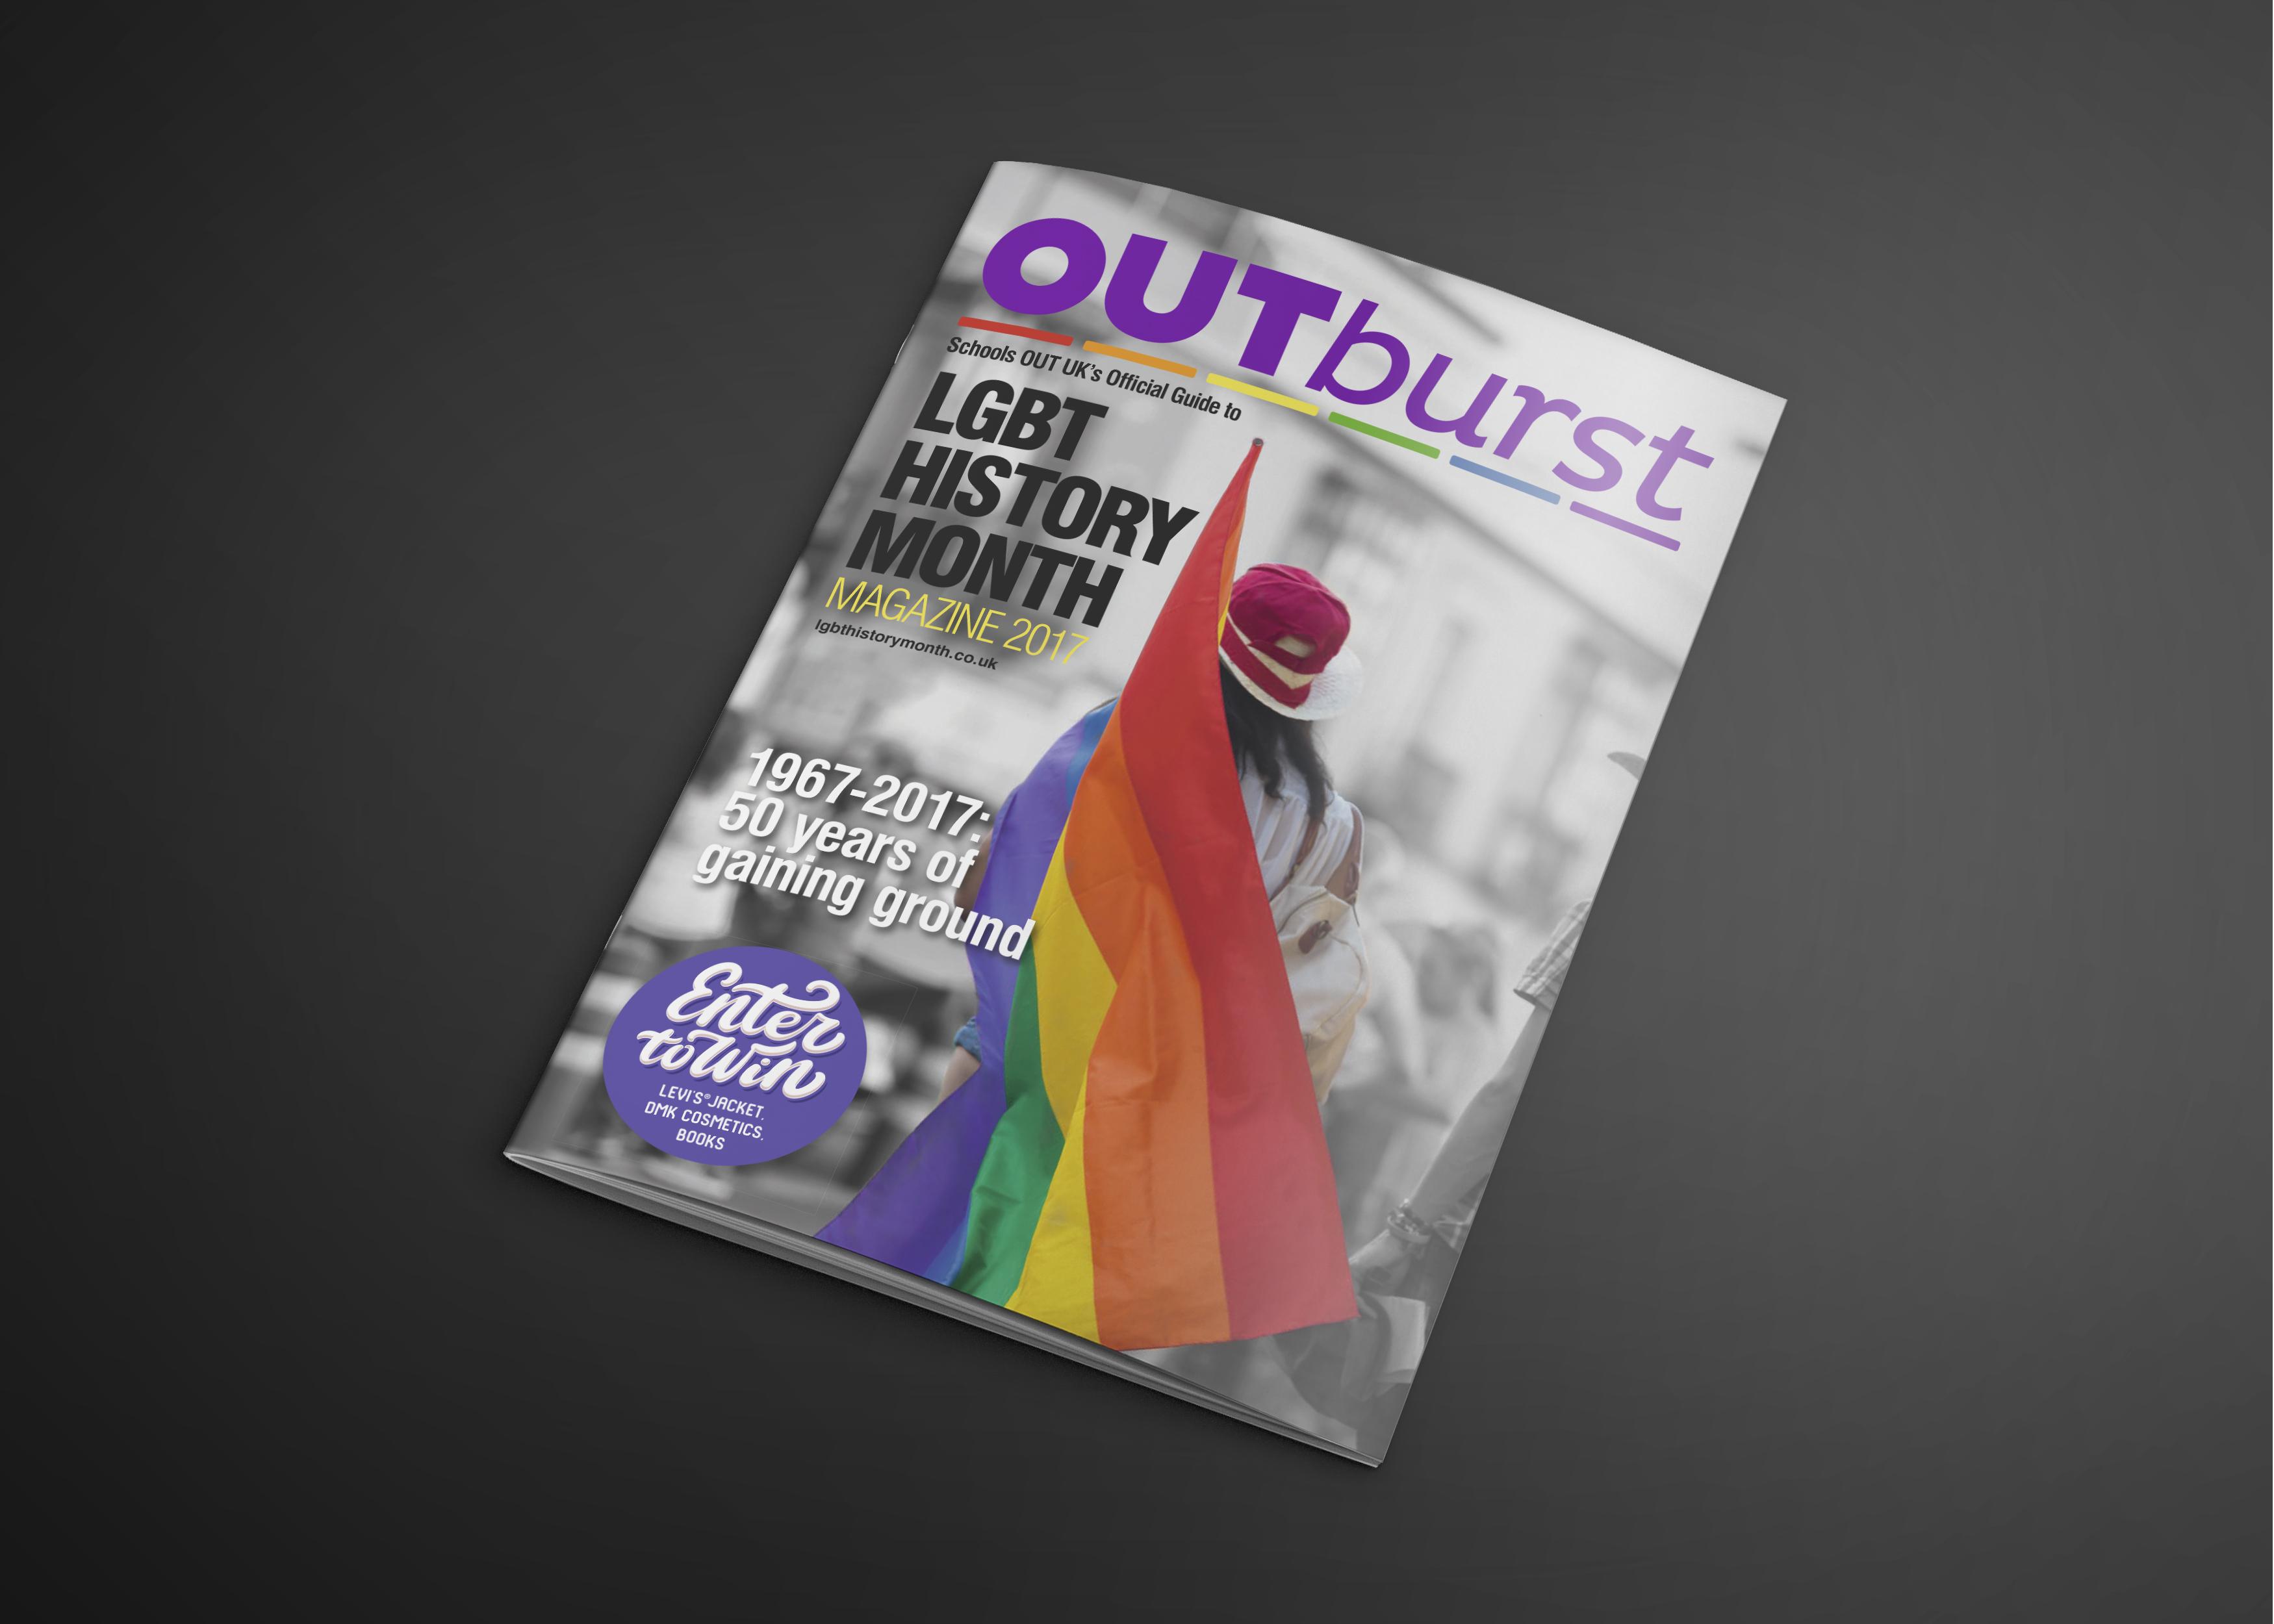 Outburst_cover